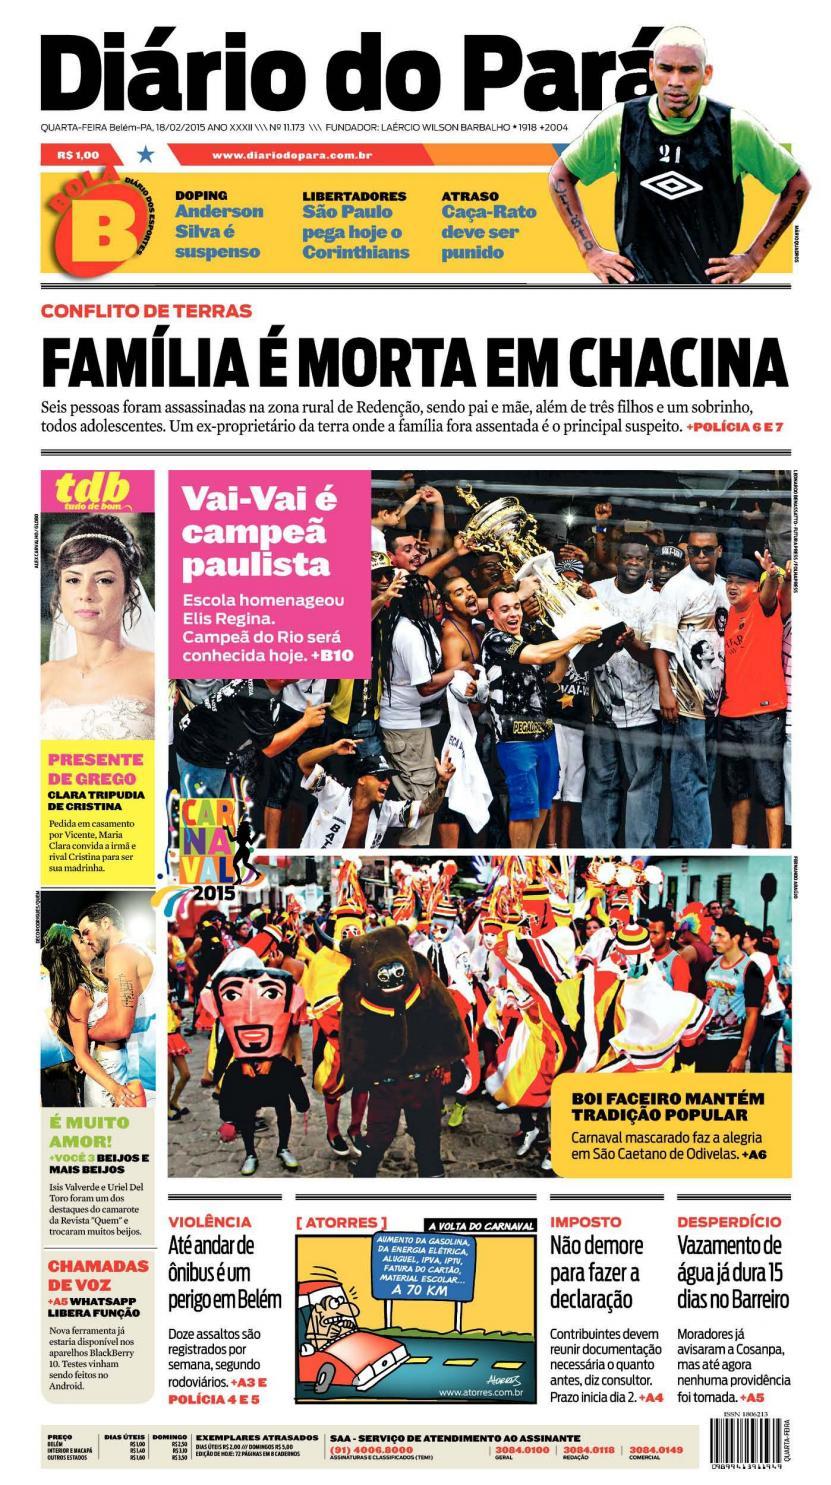 63b30e75e8 Jornal Diário do Pará Nº 11.173 by Portal Academia do Samba - issuu